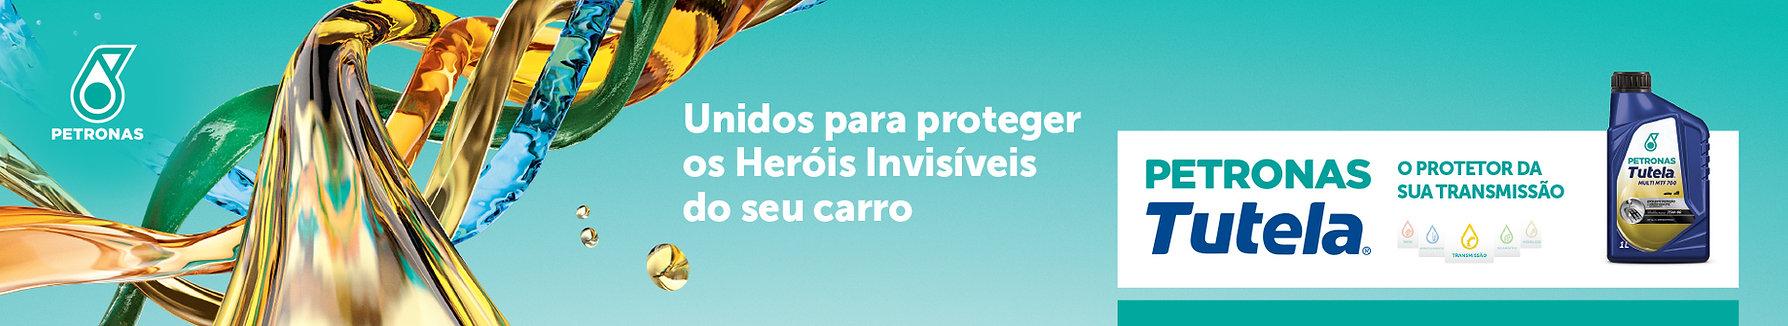 Banners digitais_Tutela.jpg